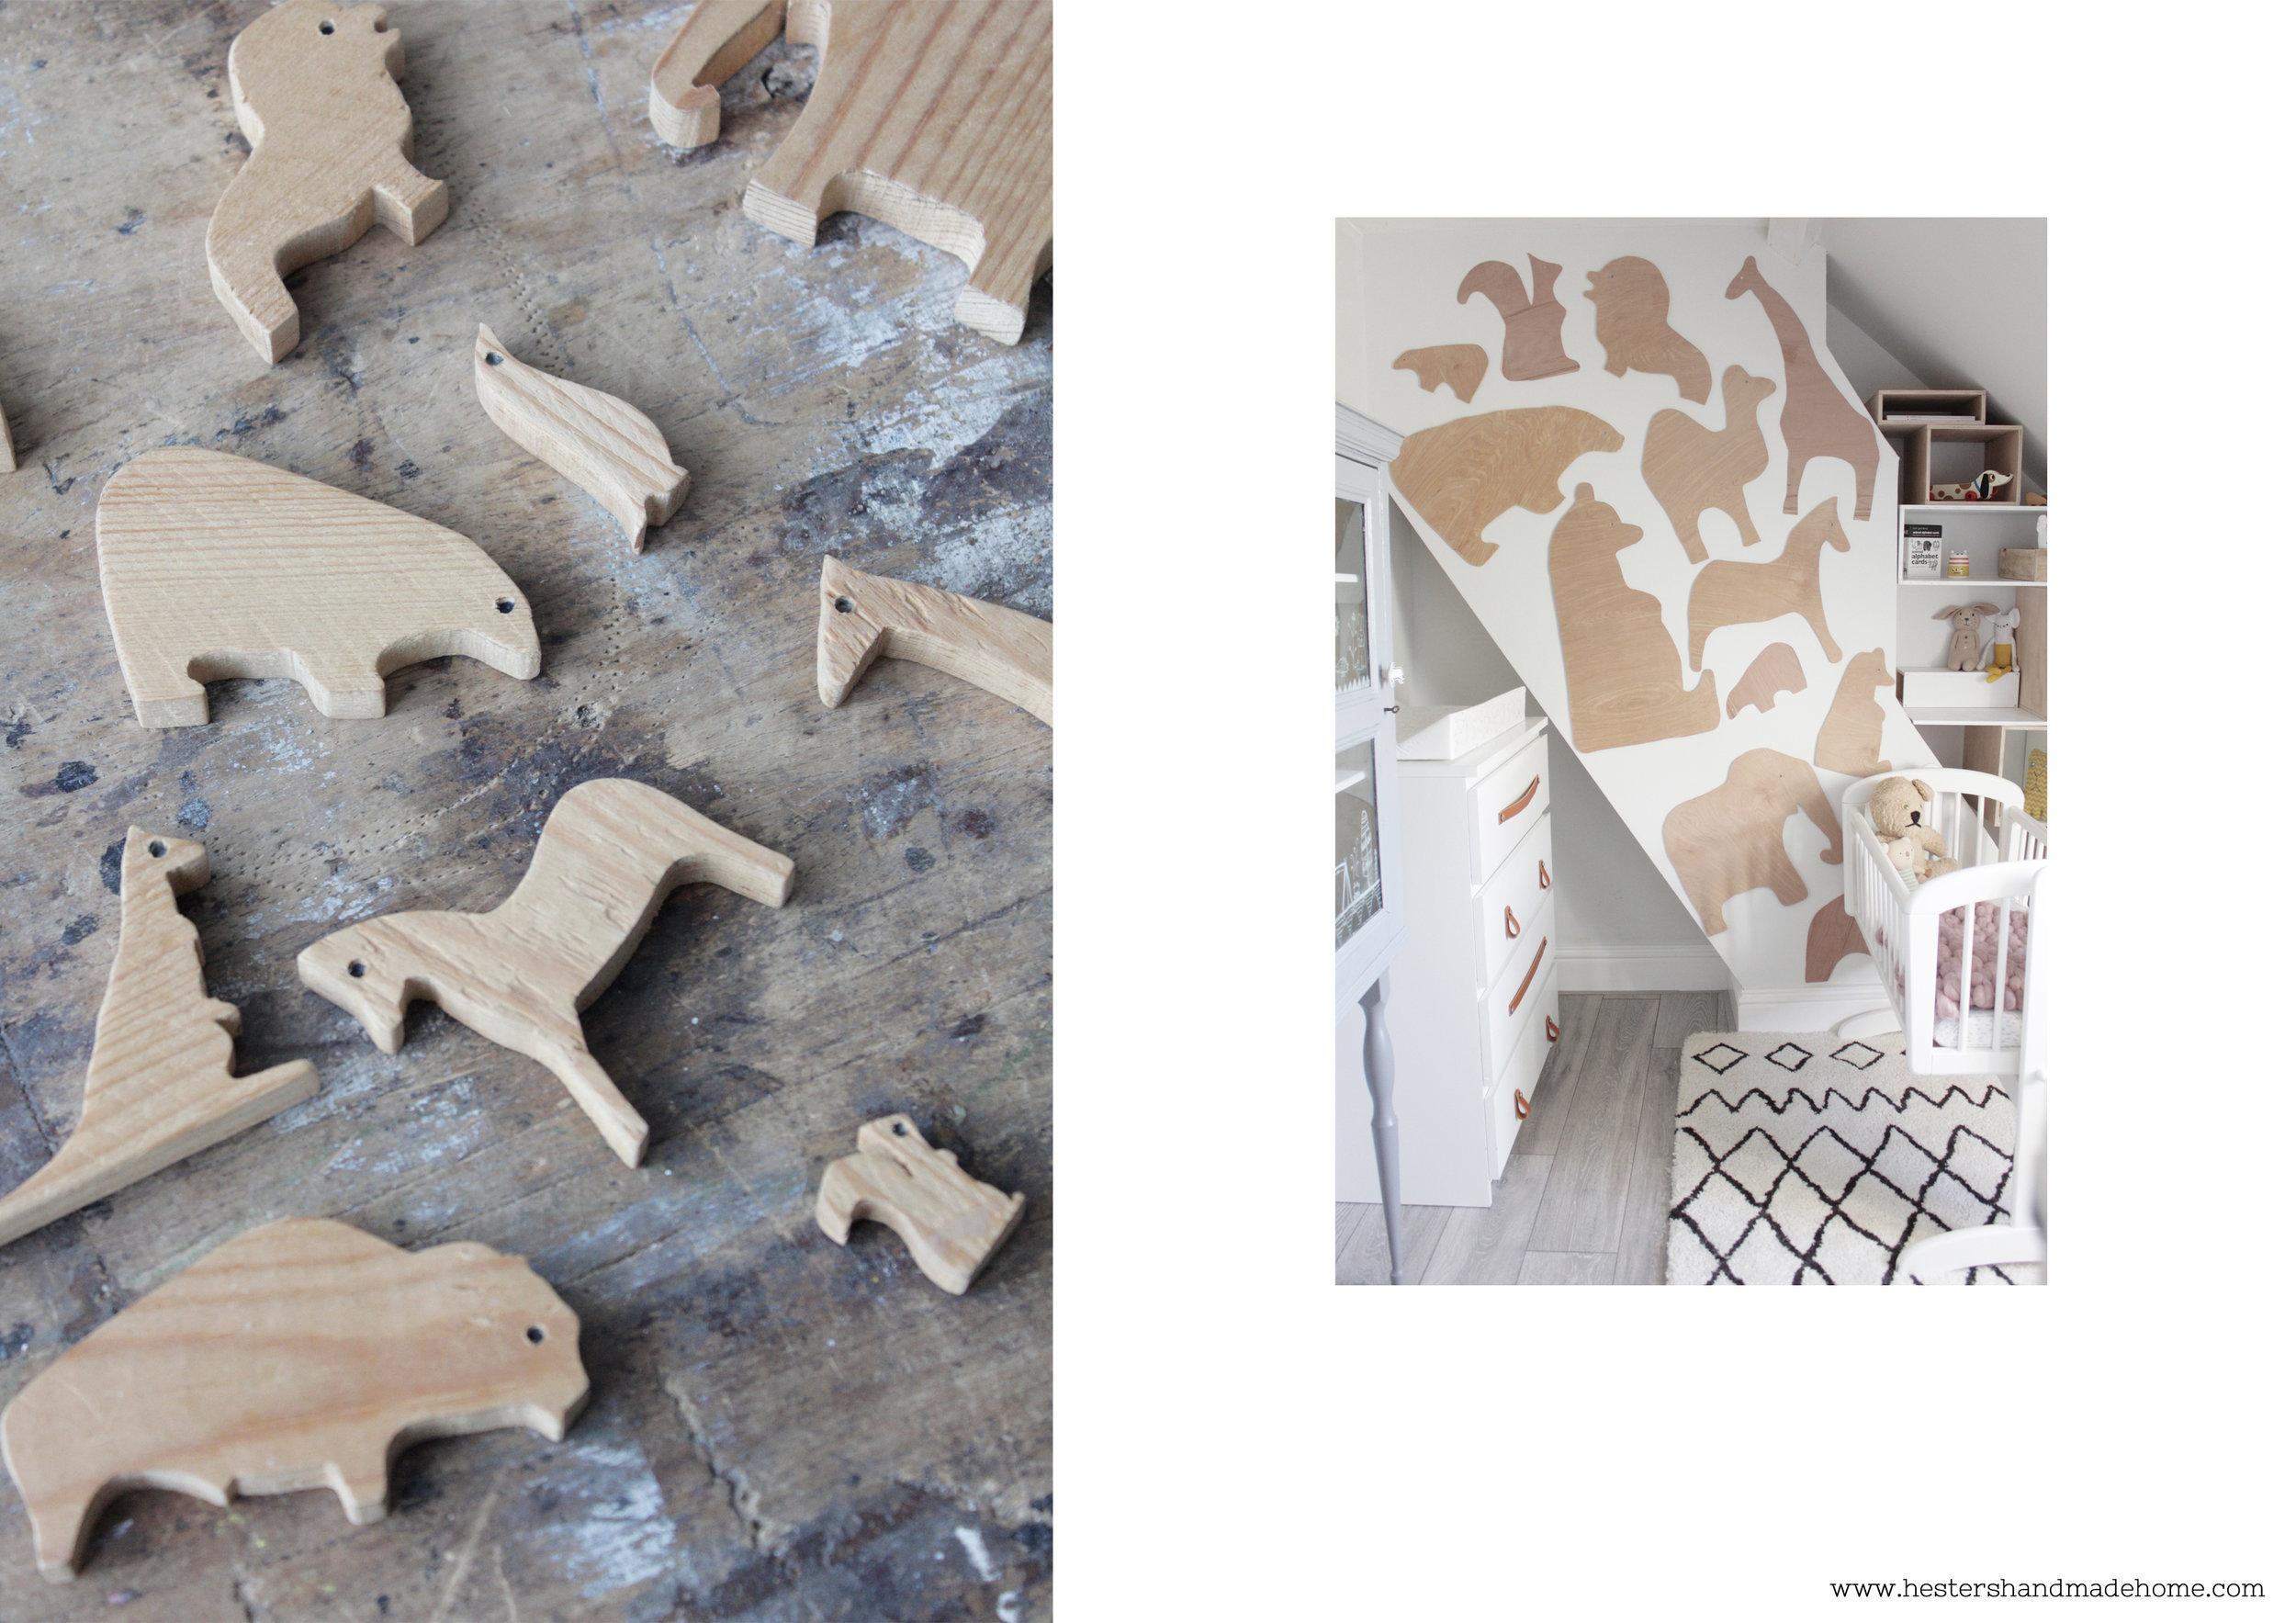 Nursery decor: plywood animal wall by www,hestershandmadehome.com